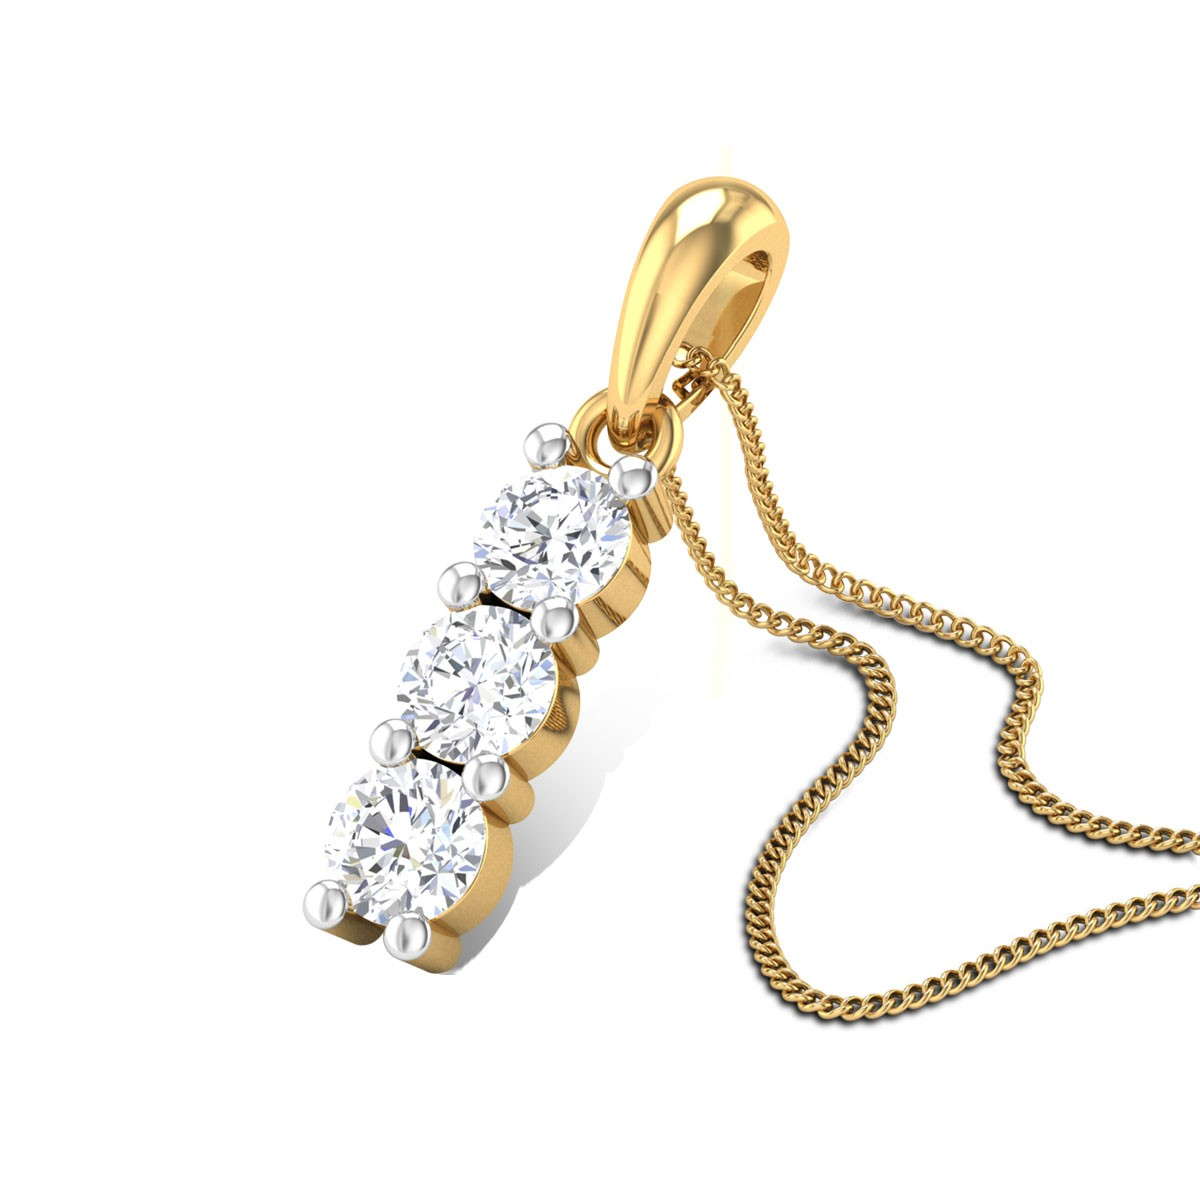 Imperial Crown Diamond Pendant